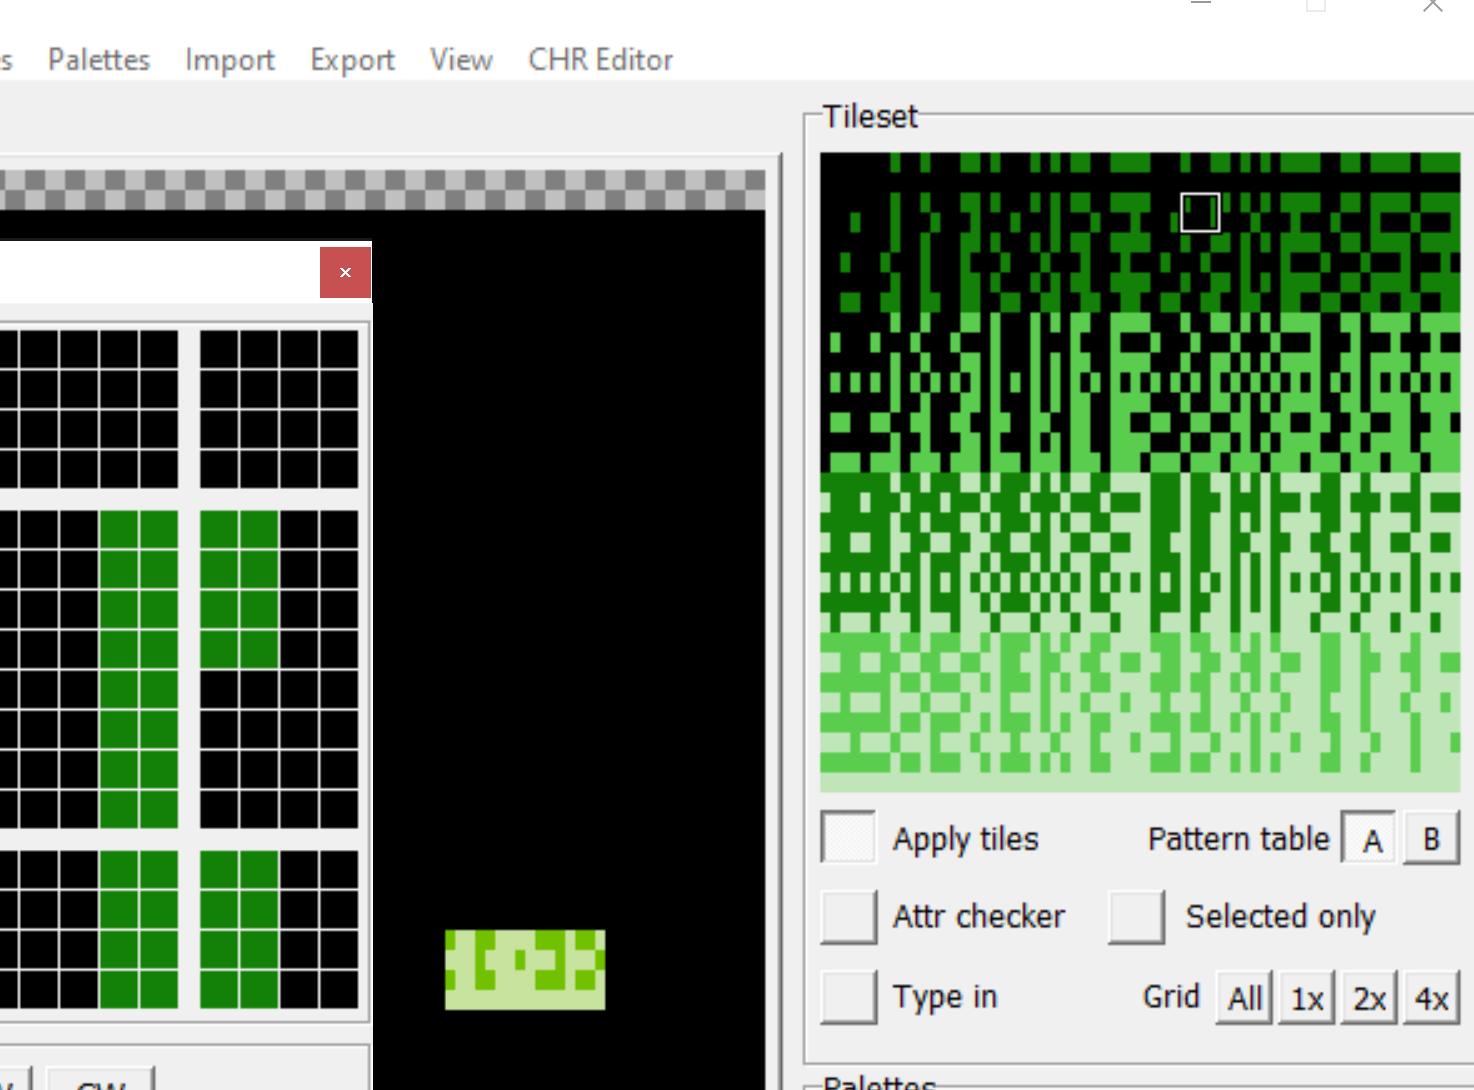 pattern_generation